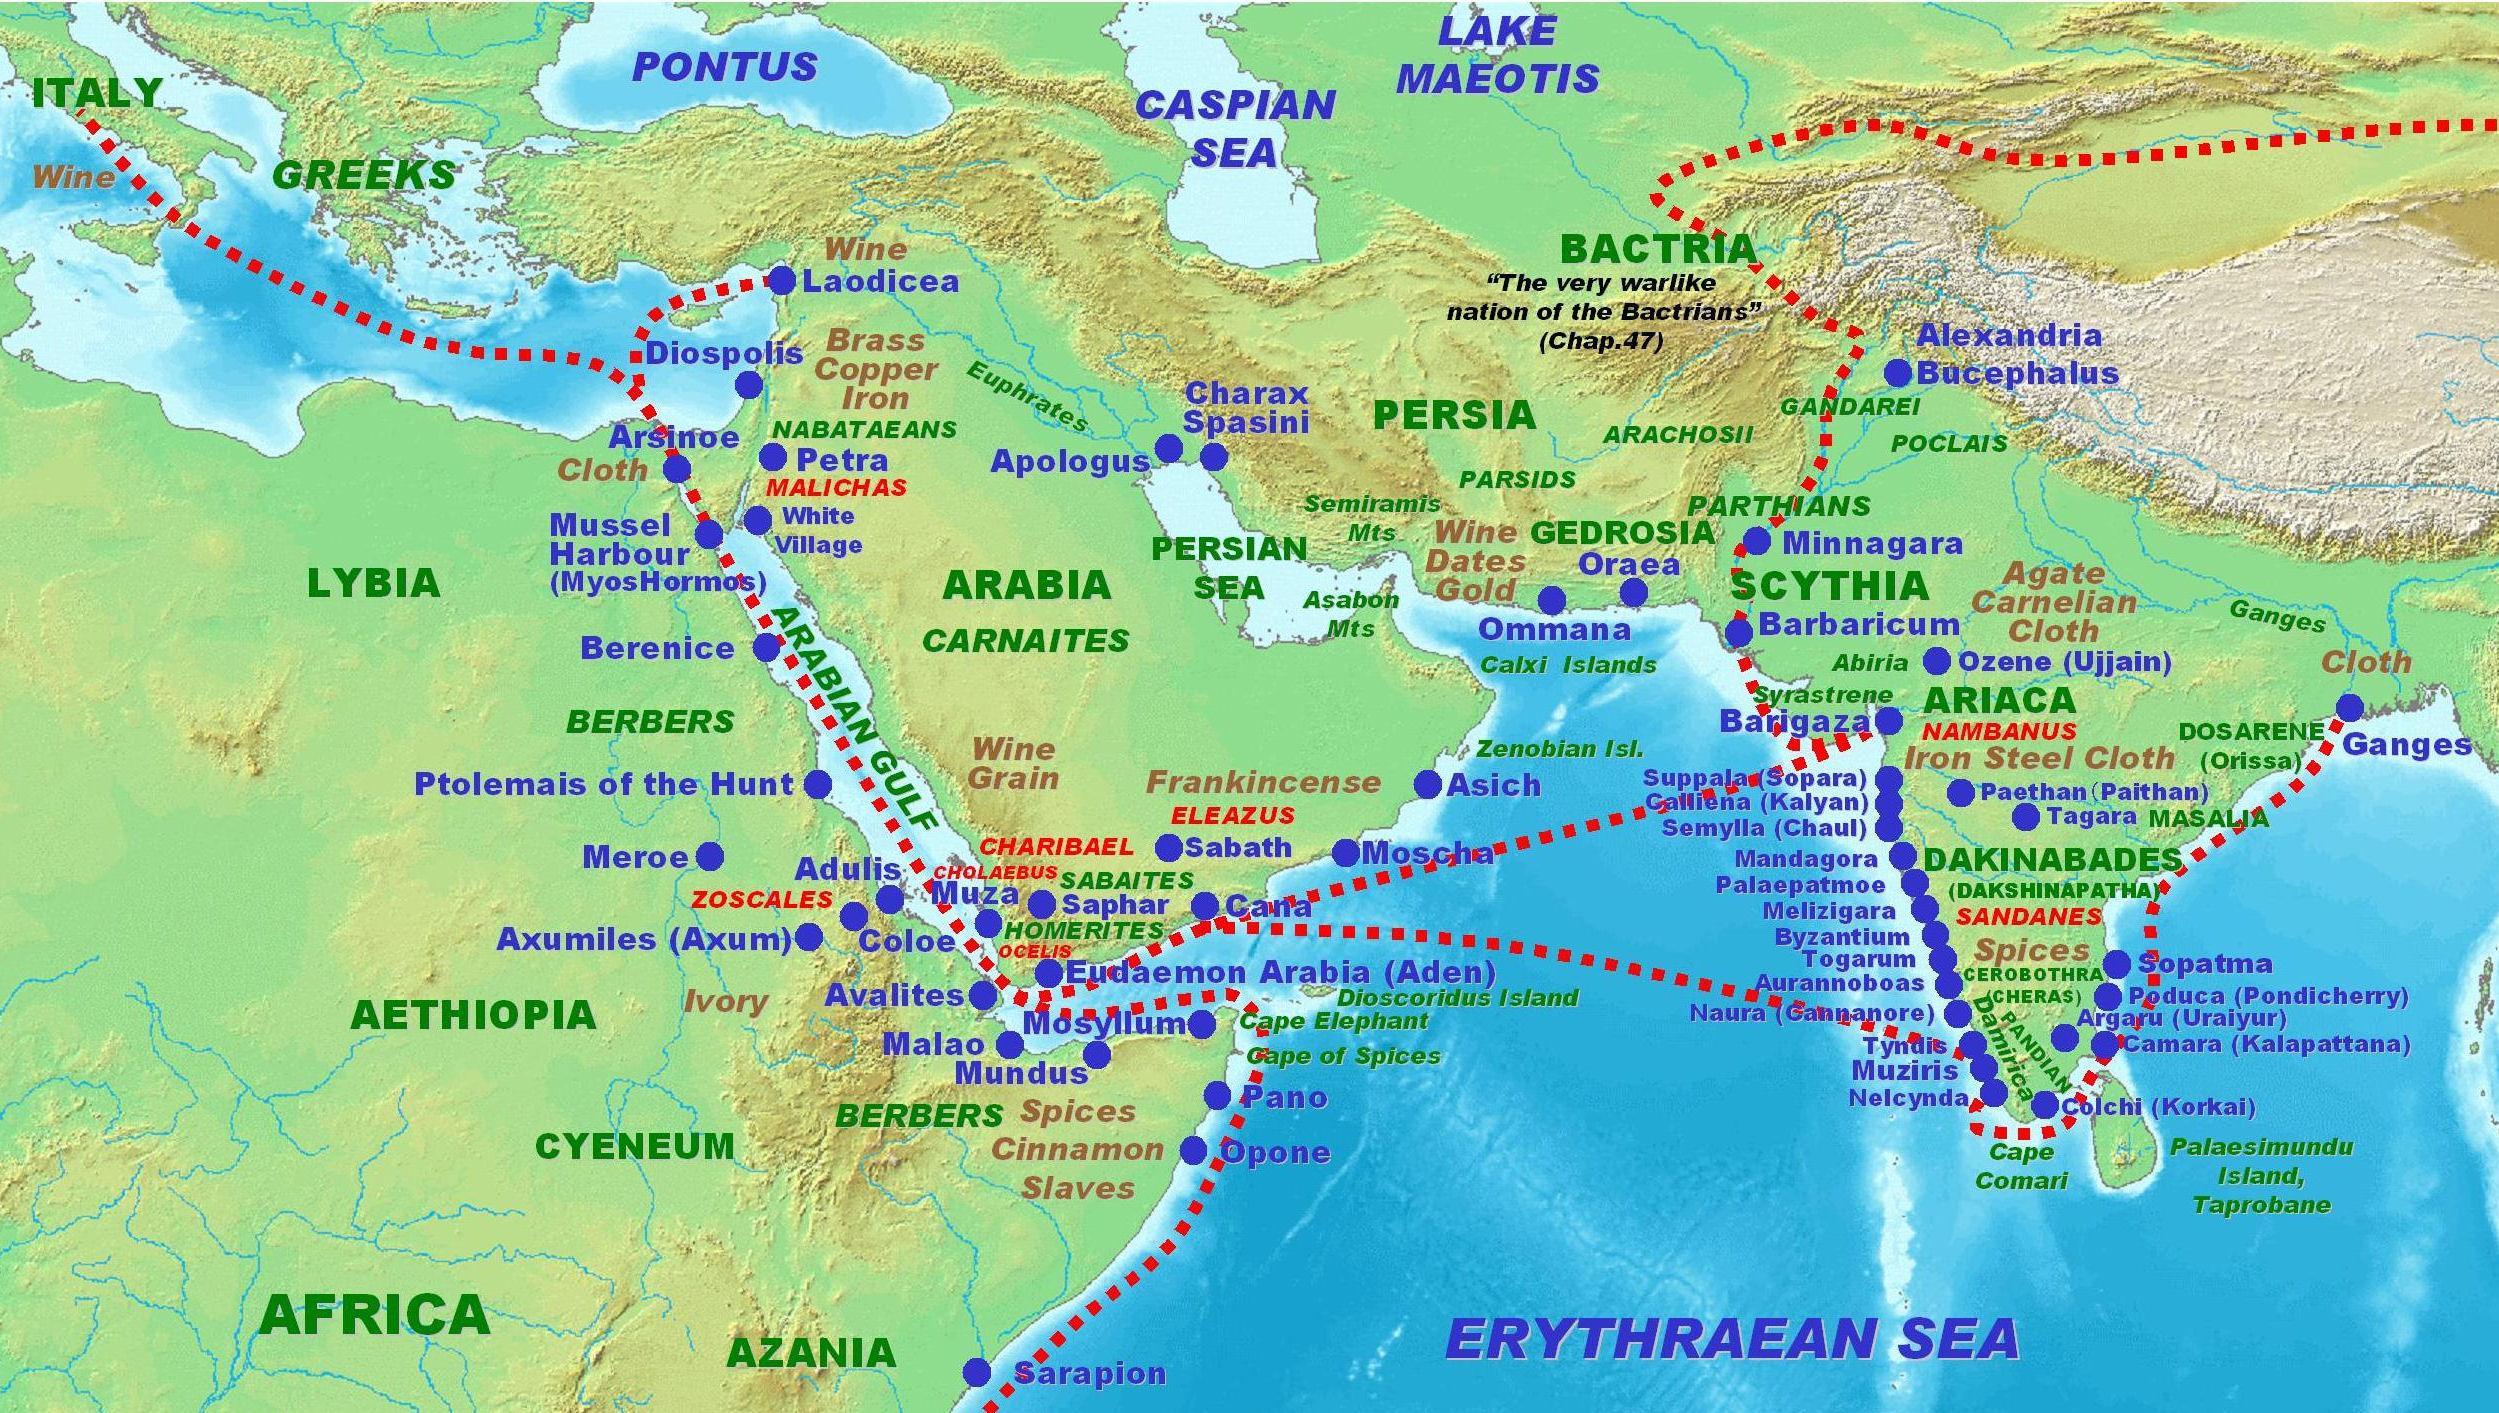 https://upload.wikimedia.org/wikipedia/commons/1/1b/Indo-Roman_trade.jpg